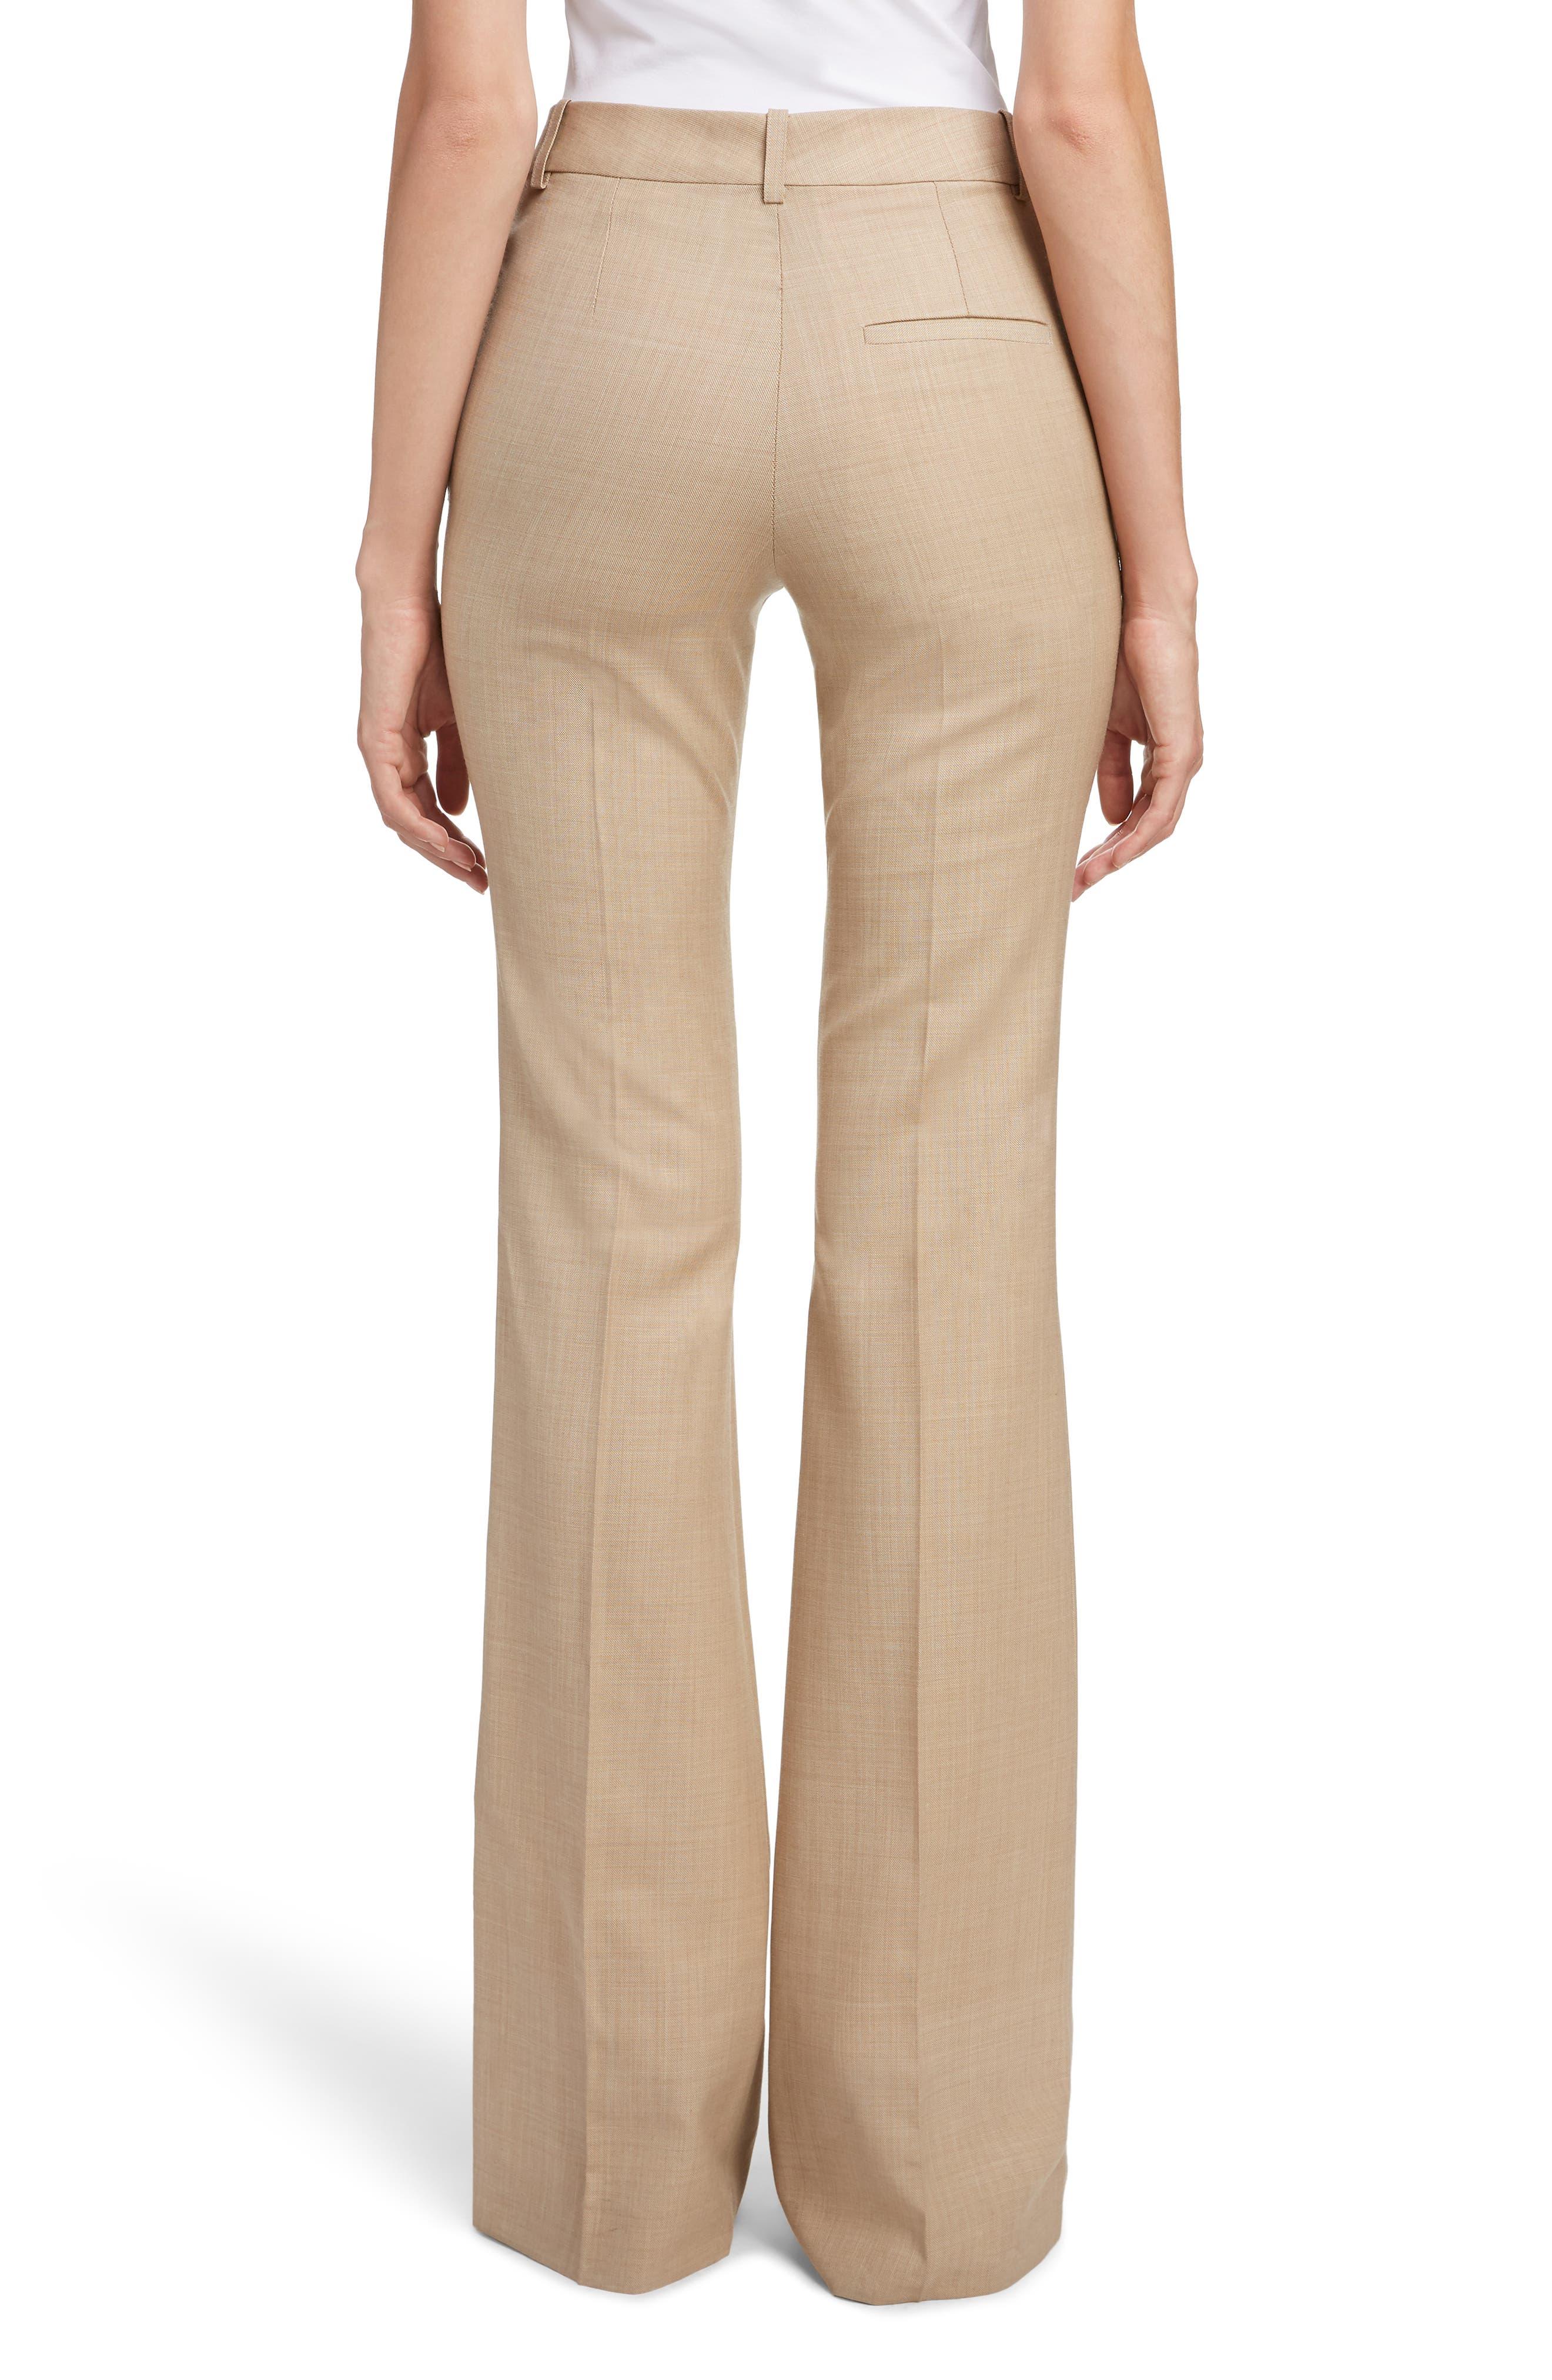 High Waist Flare Wool Pants,                             Alternate thumbnail 2, color,                             LIGHT BEIGE-WHITE